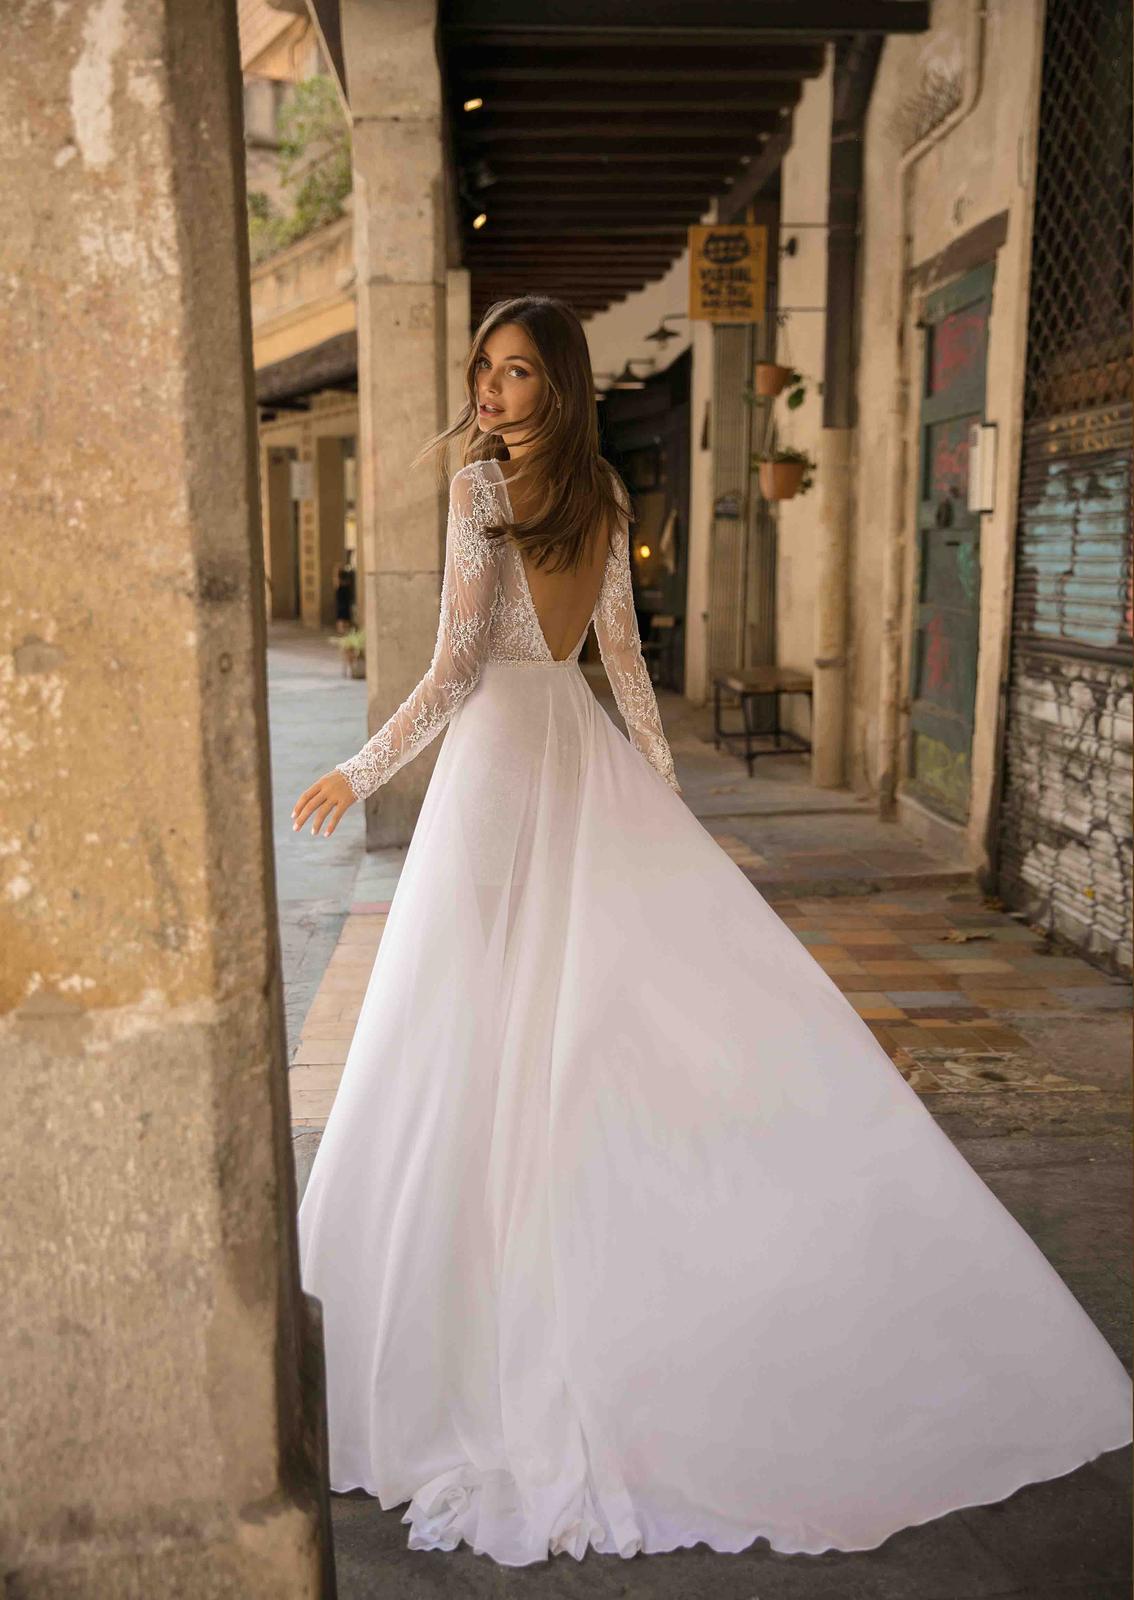 Muse by Berta * Svadobné šaty z kolekcií na rok 2019 - Obrázok č. 11